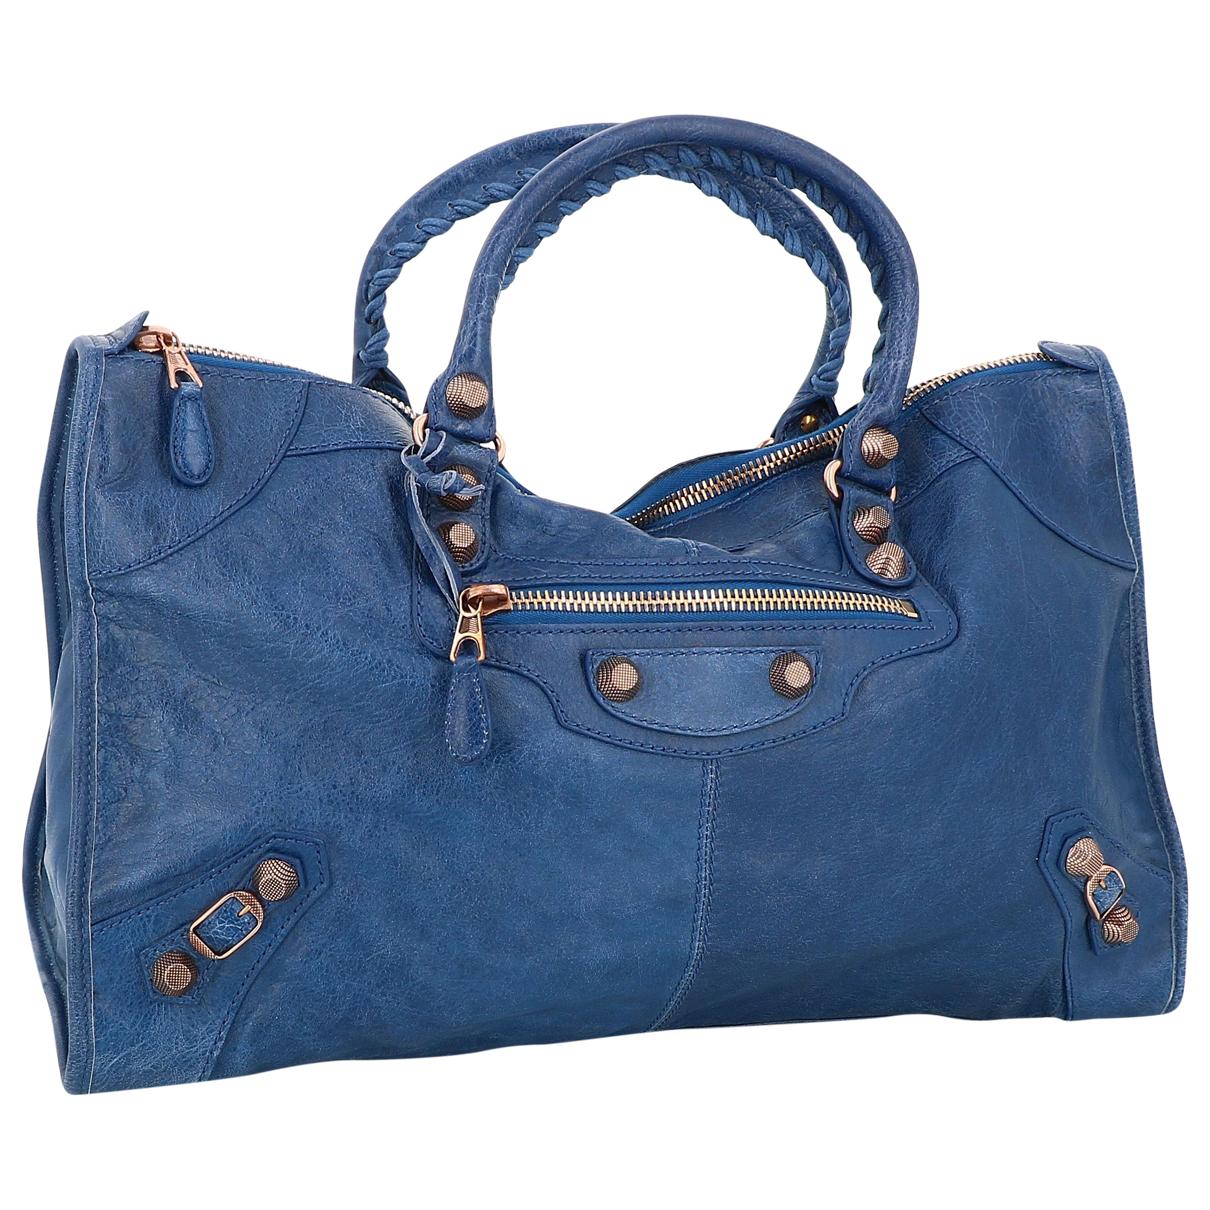 Balenciaga - Sac a main City pour femme en cuir - bleu